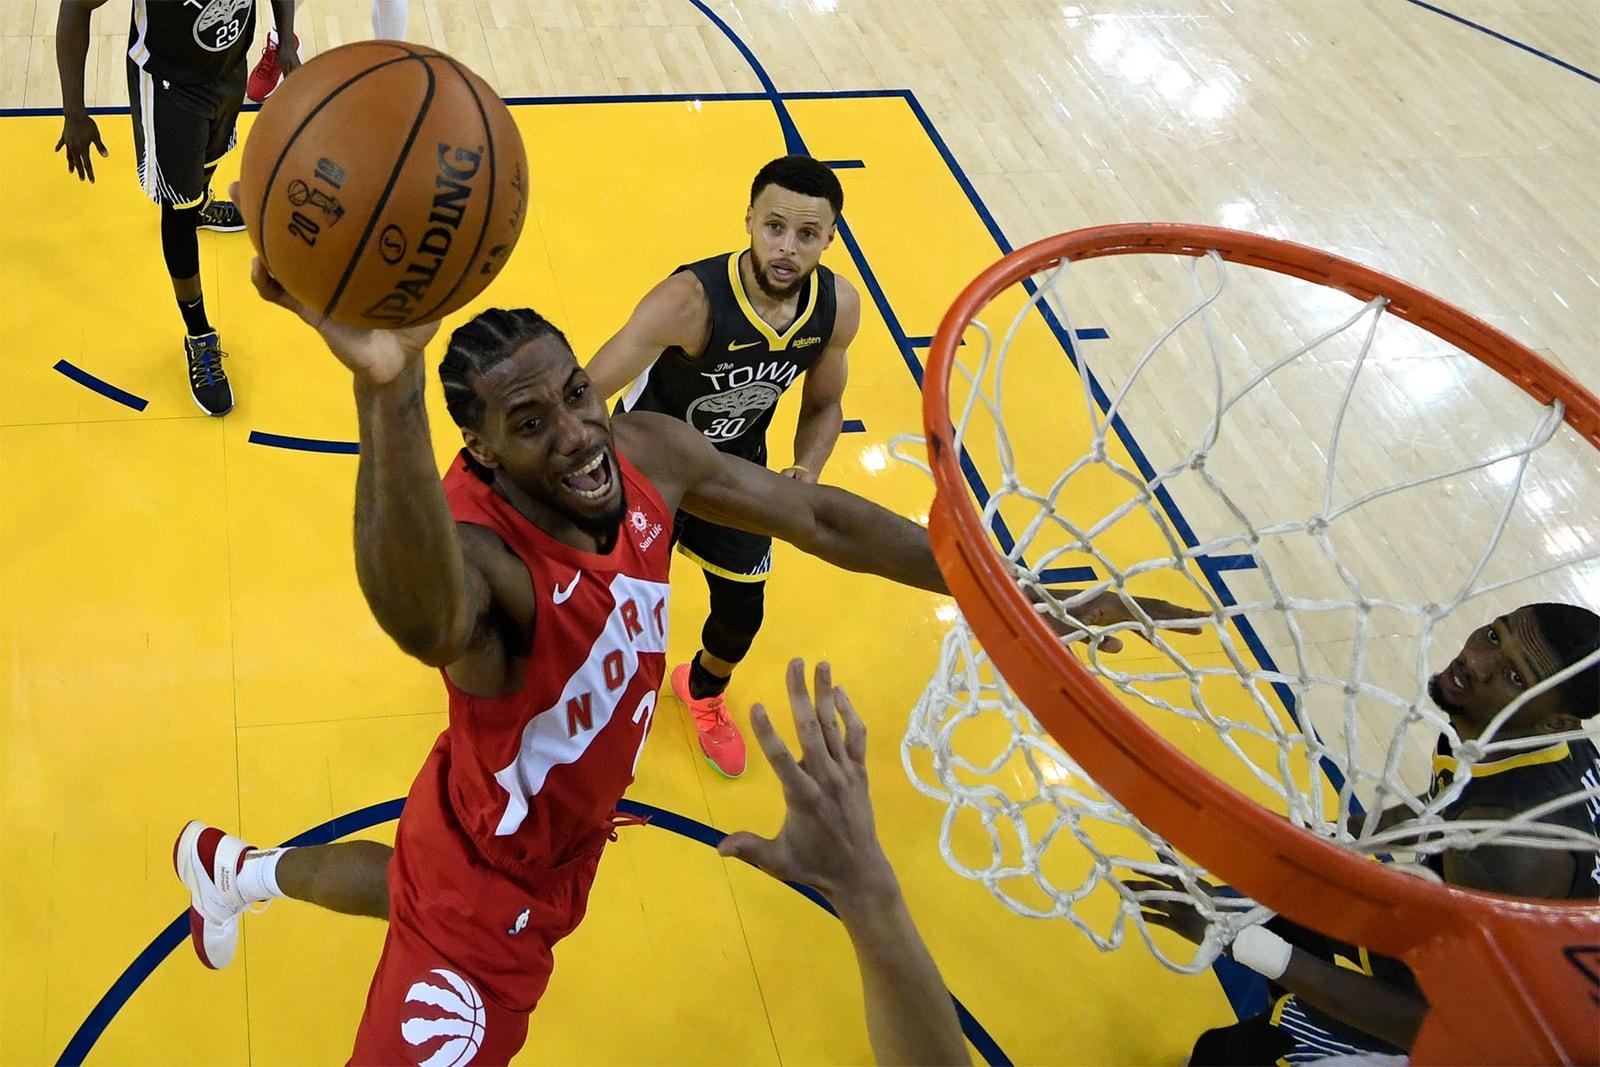 NBAファイナルを総括 Toronto Raptors Golden State Warriors 2019 NBA Champions Drake Basketball Game 6 Win First Kawhi Leonard(カワイ・レナード) Stephen Curry(ステフィン・カリー) Kevin Durant(ケビン・デュラント) Klay Thompson(クレイ・トンプソン)